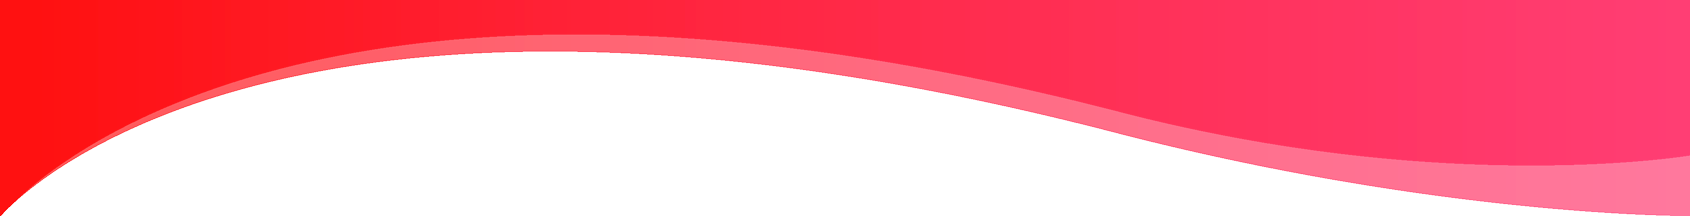 UBROKER-onda-down-1690x216px.png